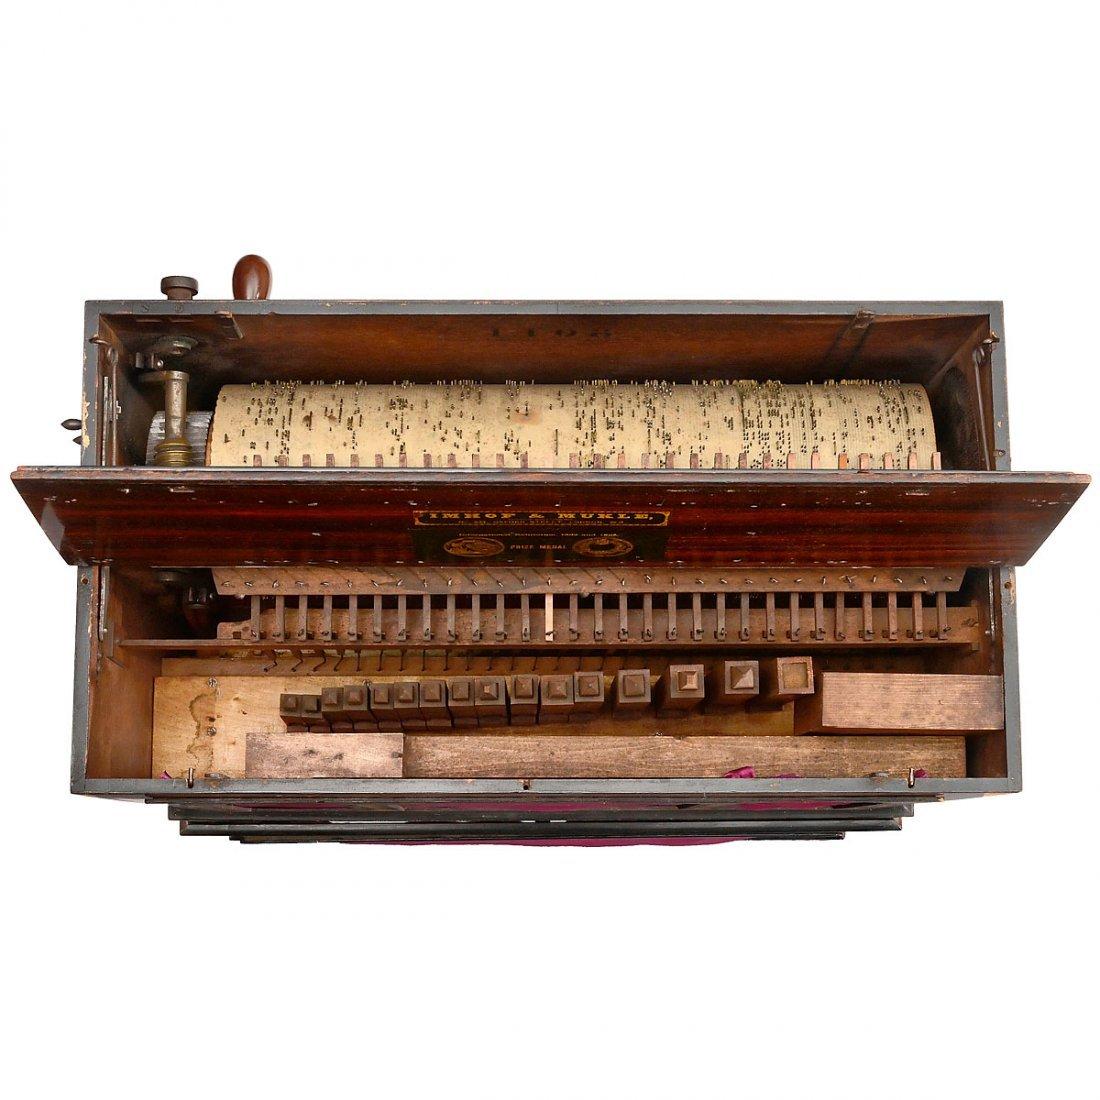 Barrel Organ by Imhof & Mukle, c. 1870 - 3